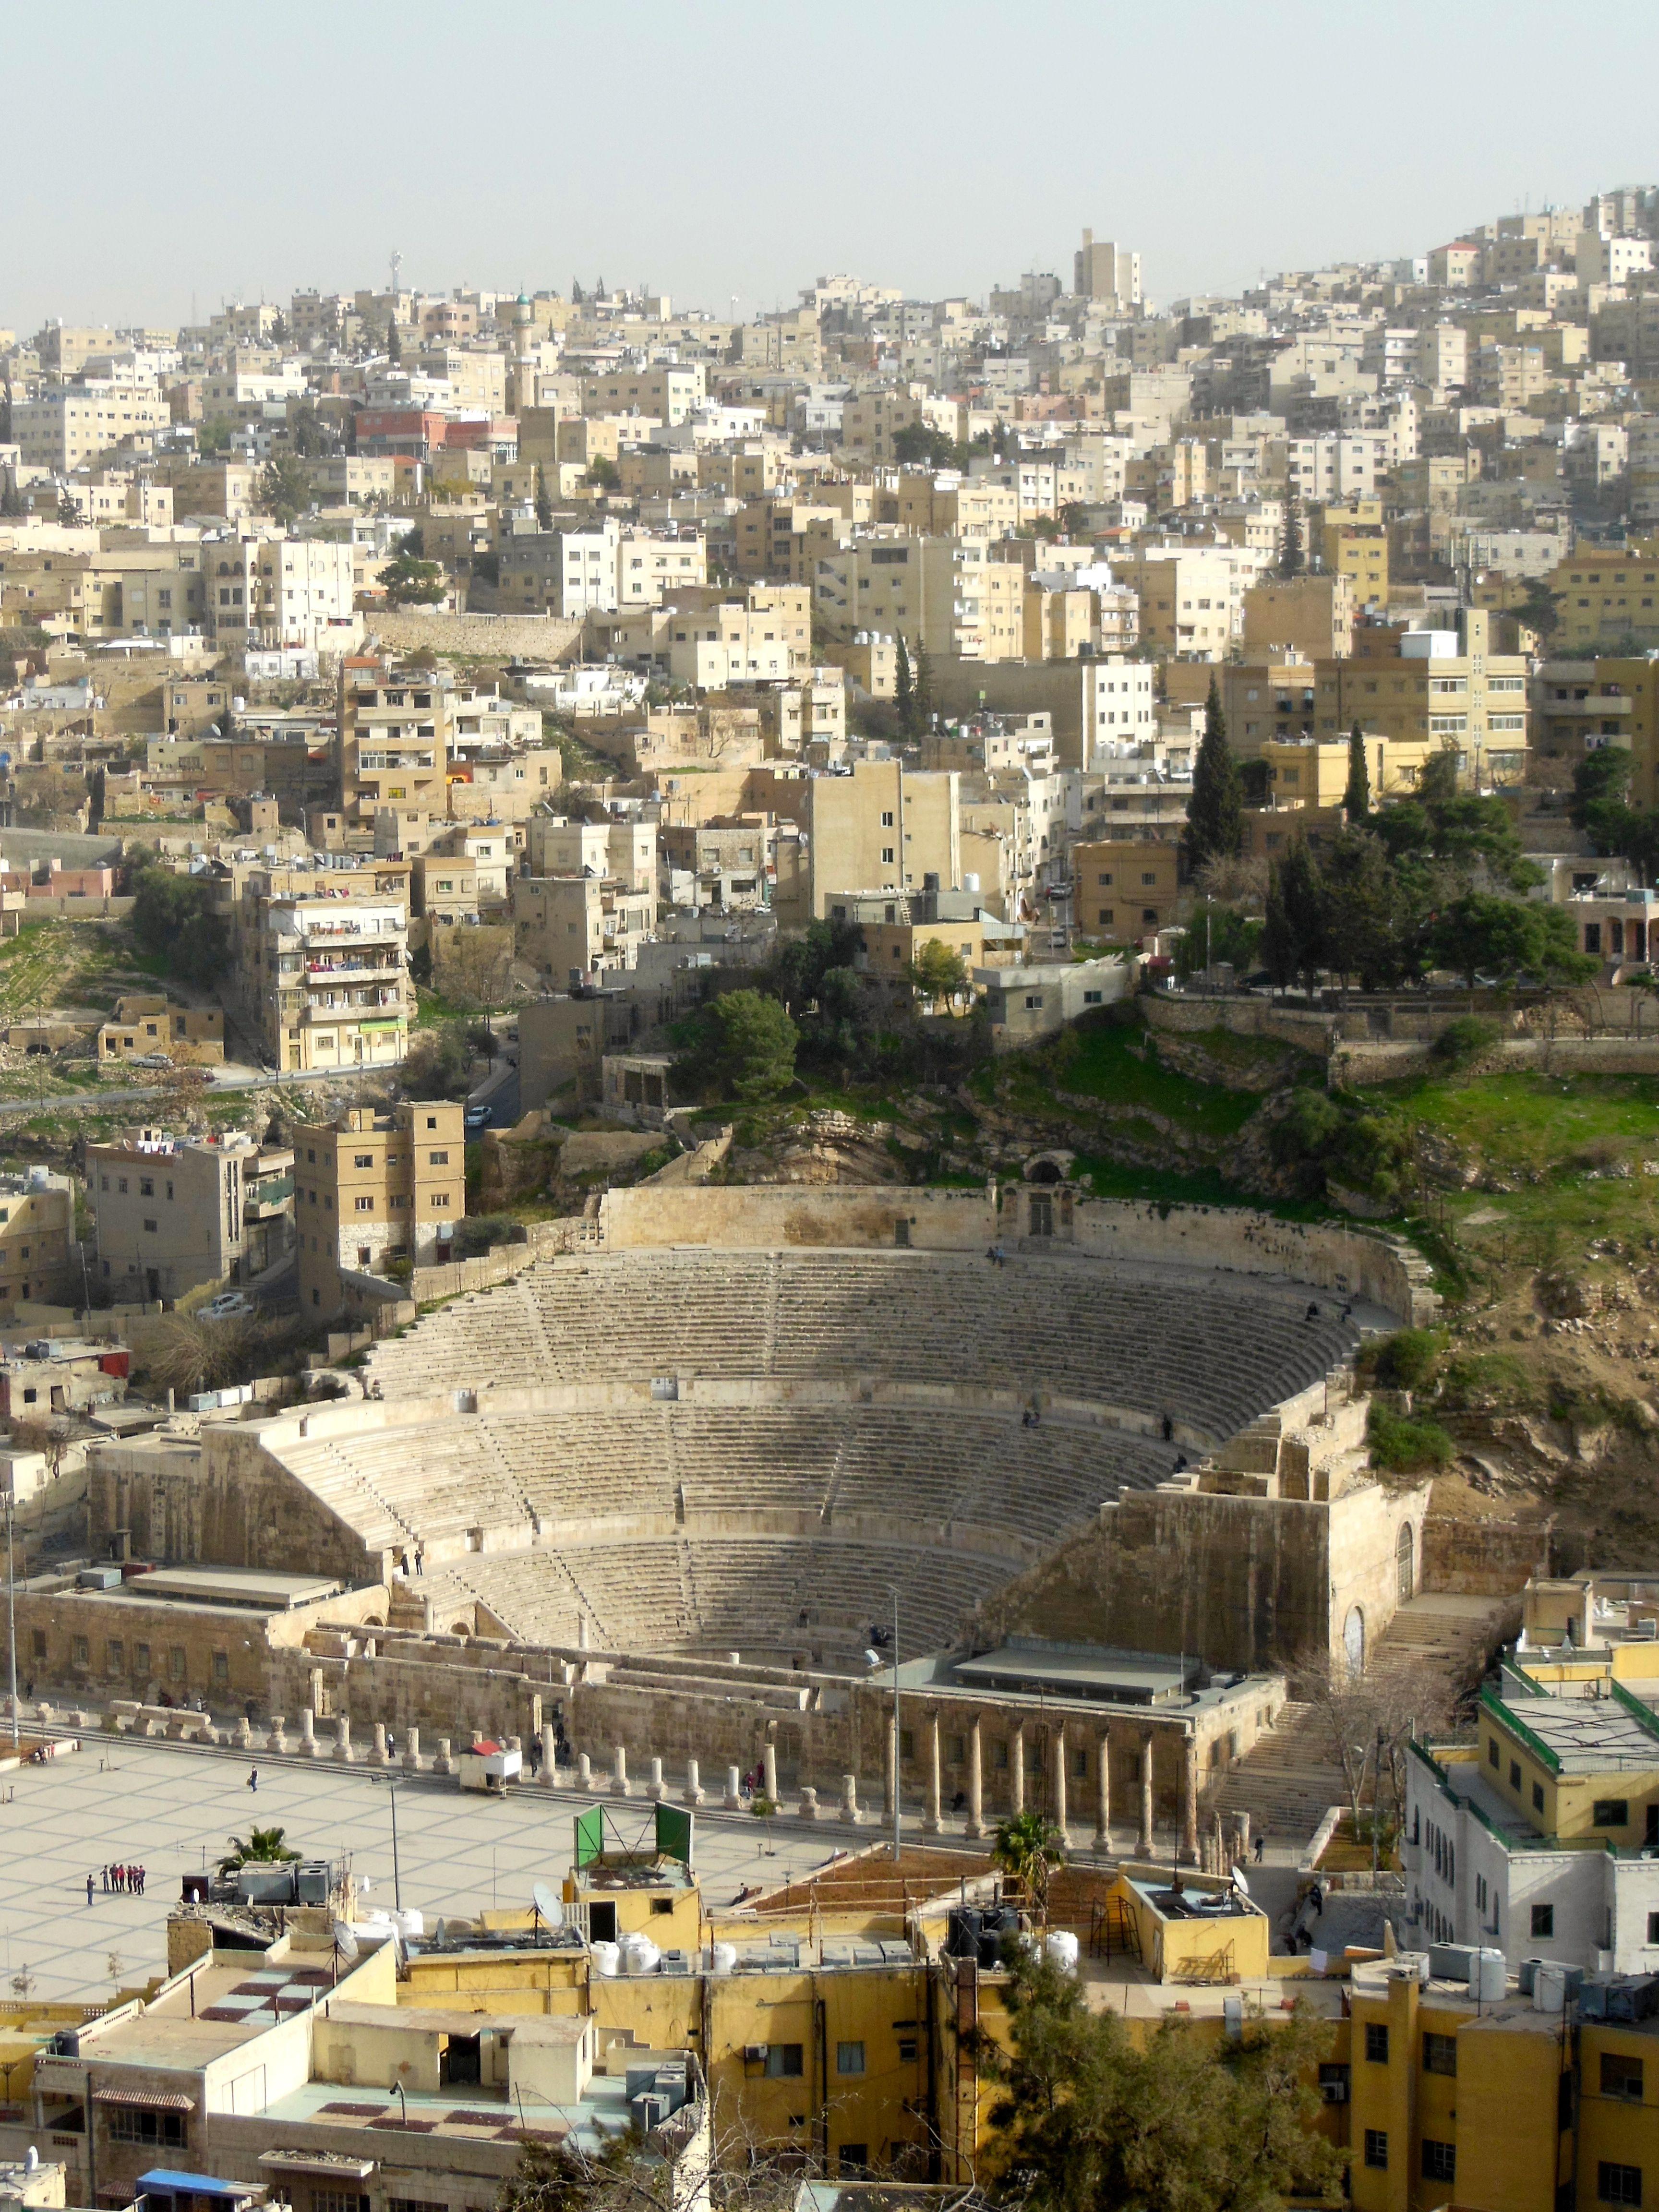 View of the amphitheatre in Amman, Jordan.